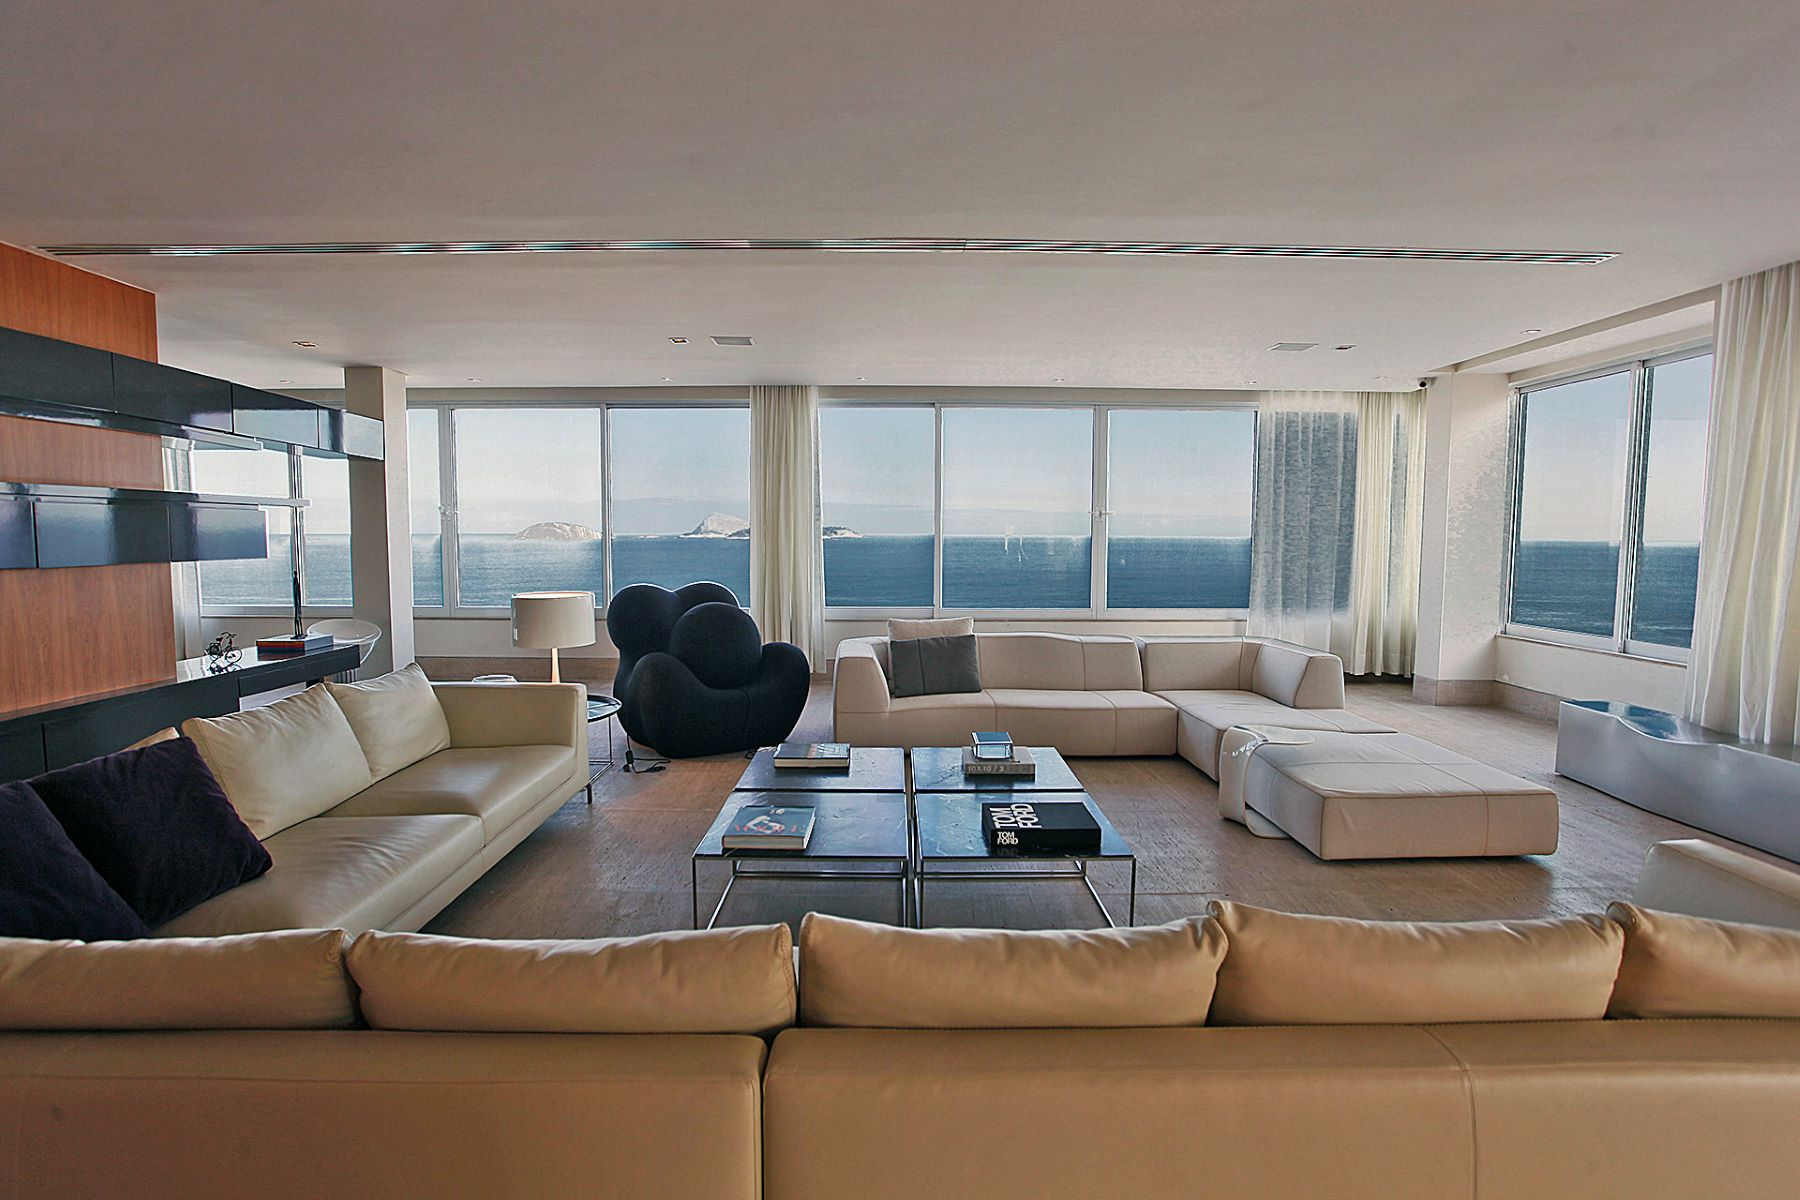 Single Family Homes for Sale at Exclusive penthouse in prime location Other Rio De Janeiro, Rio de Janeiro Brazil